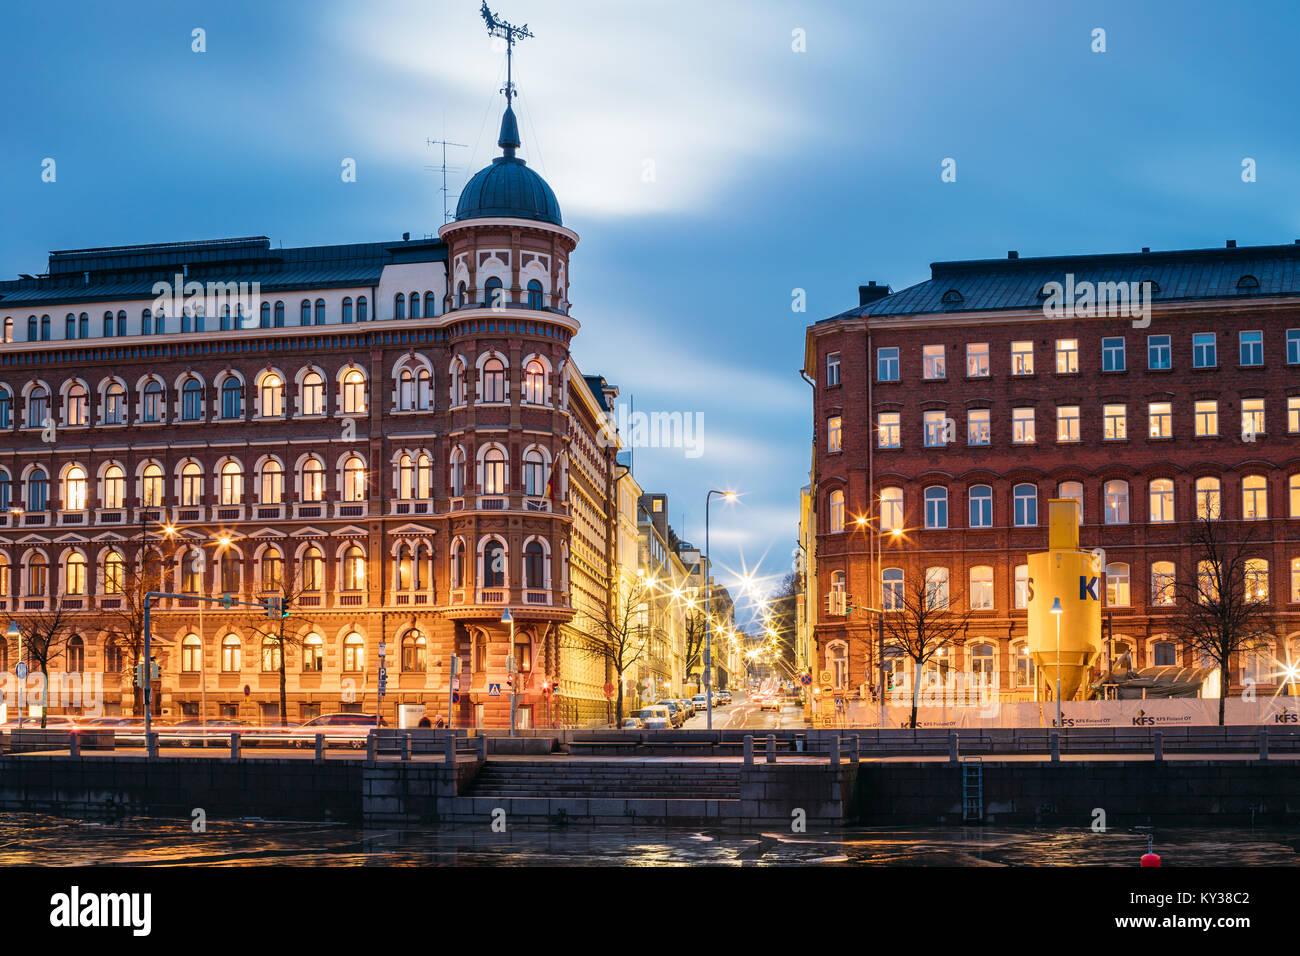 Helsinki, Finlande - décembre 9, 2016: Carrefour de Pohjoisranta et Kirkkokatu Street dans la soirée Photo Stock